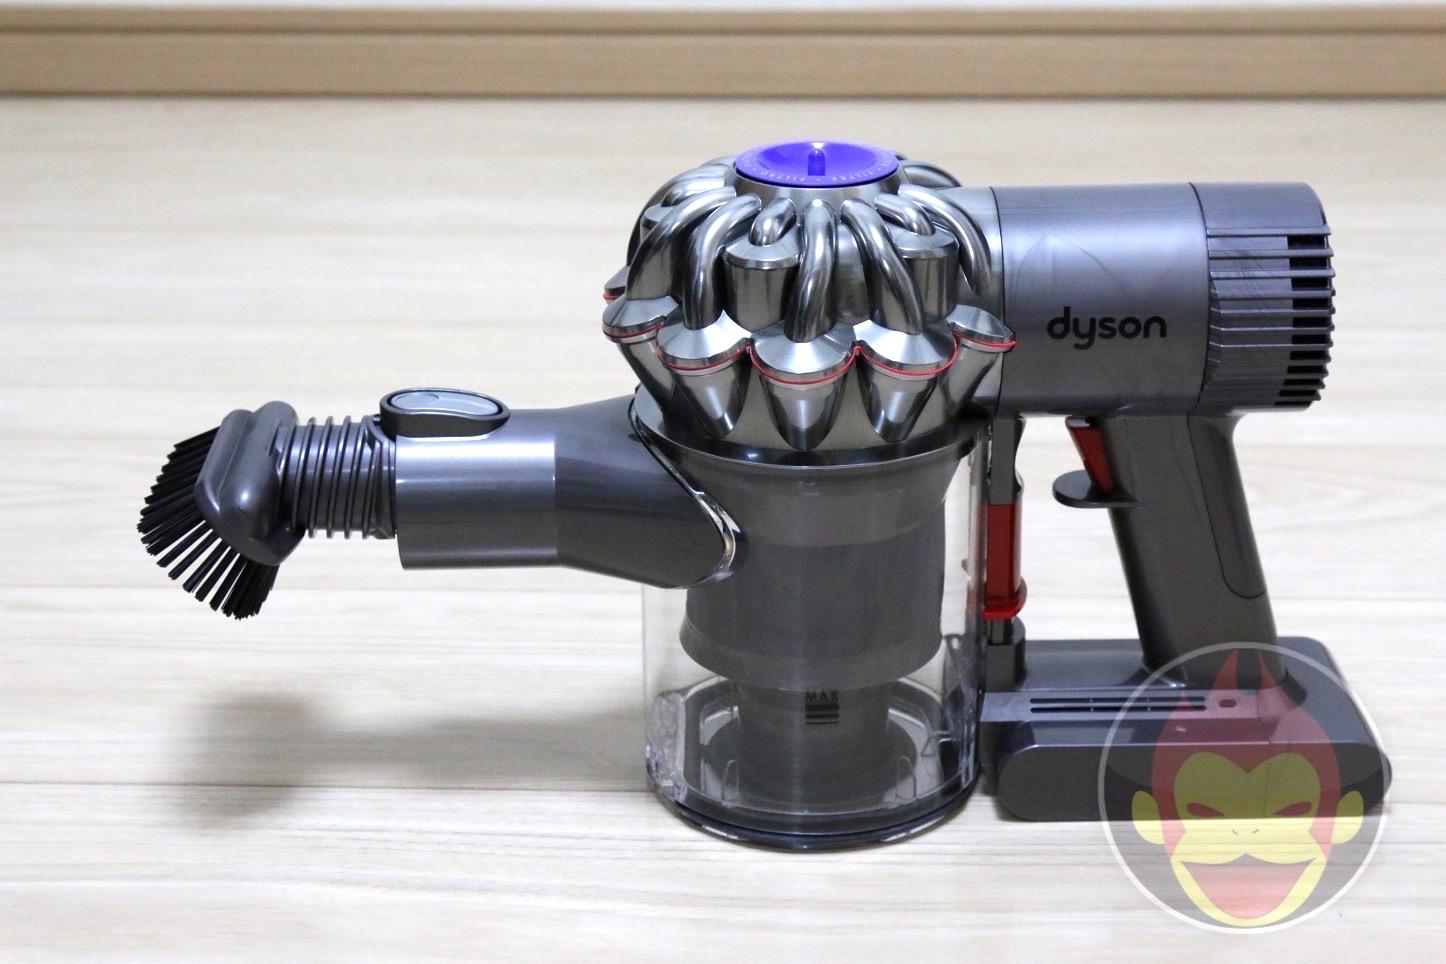 Dyson-DC62-72.JPG